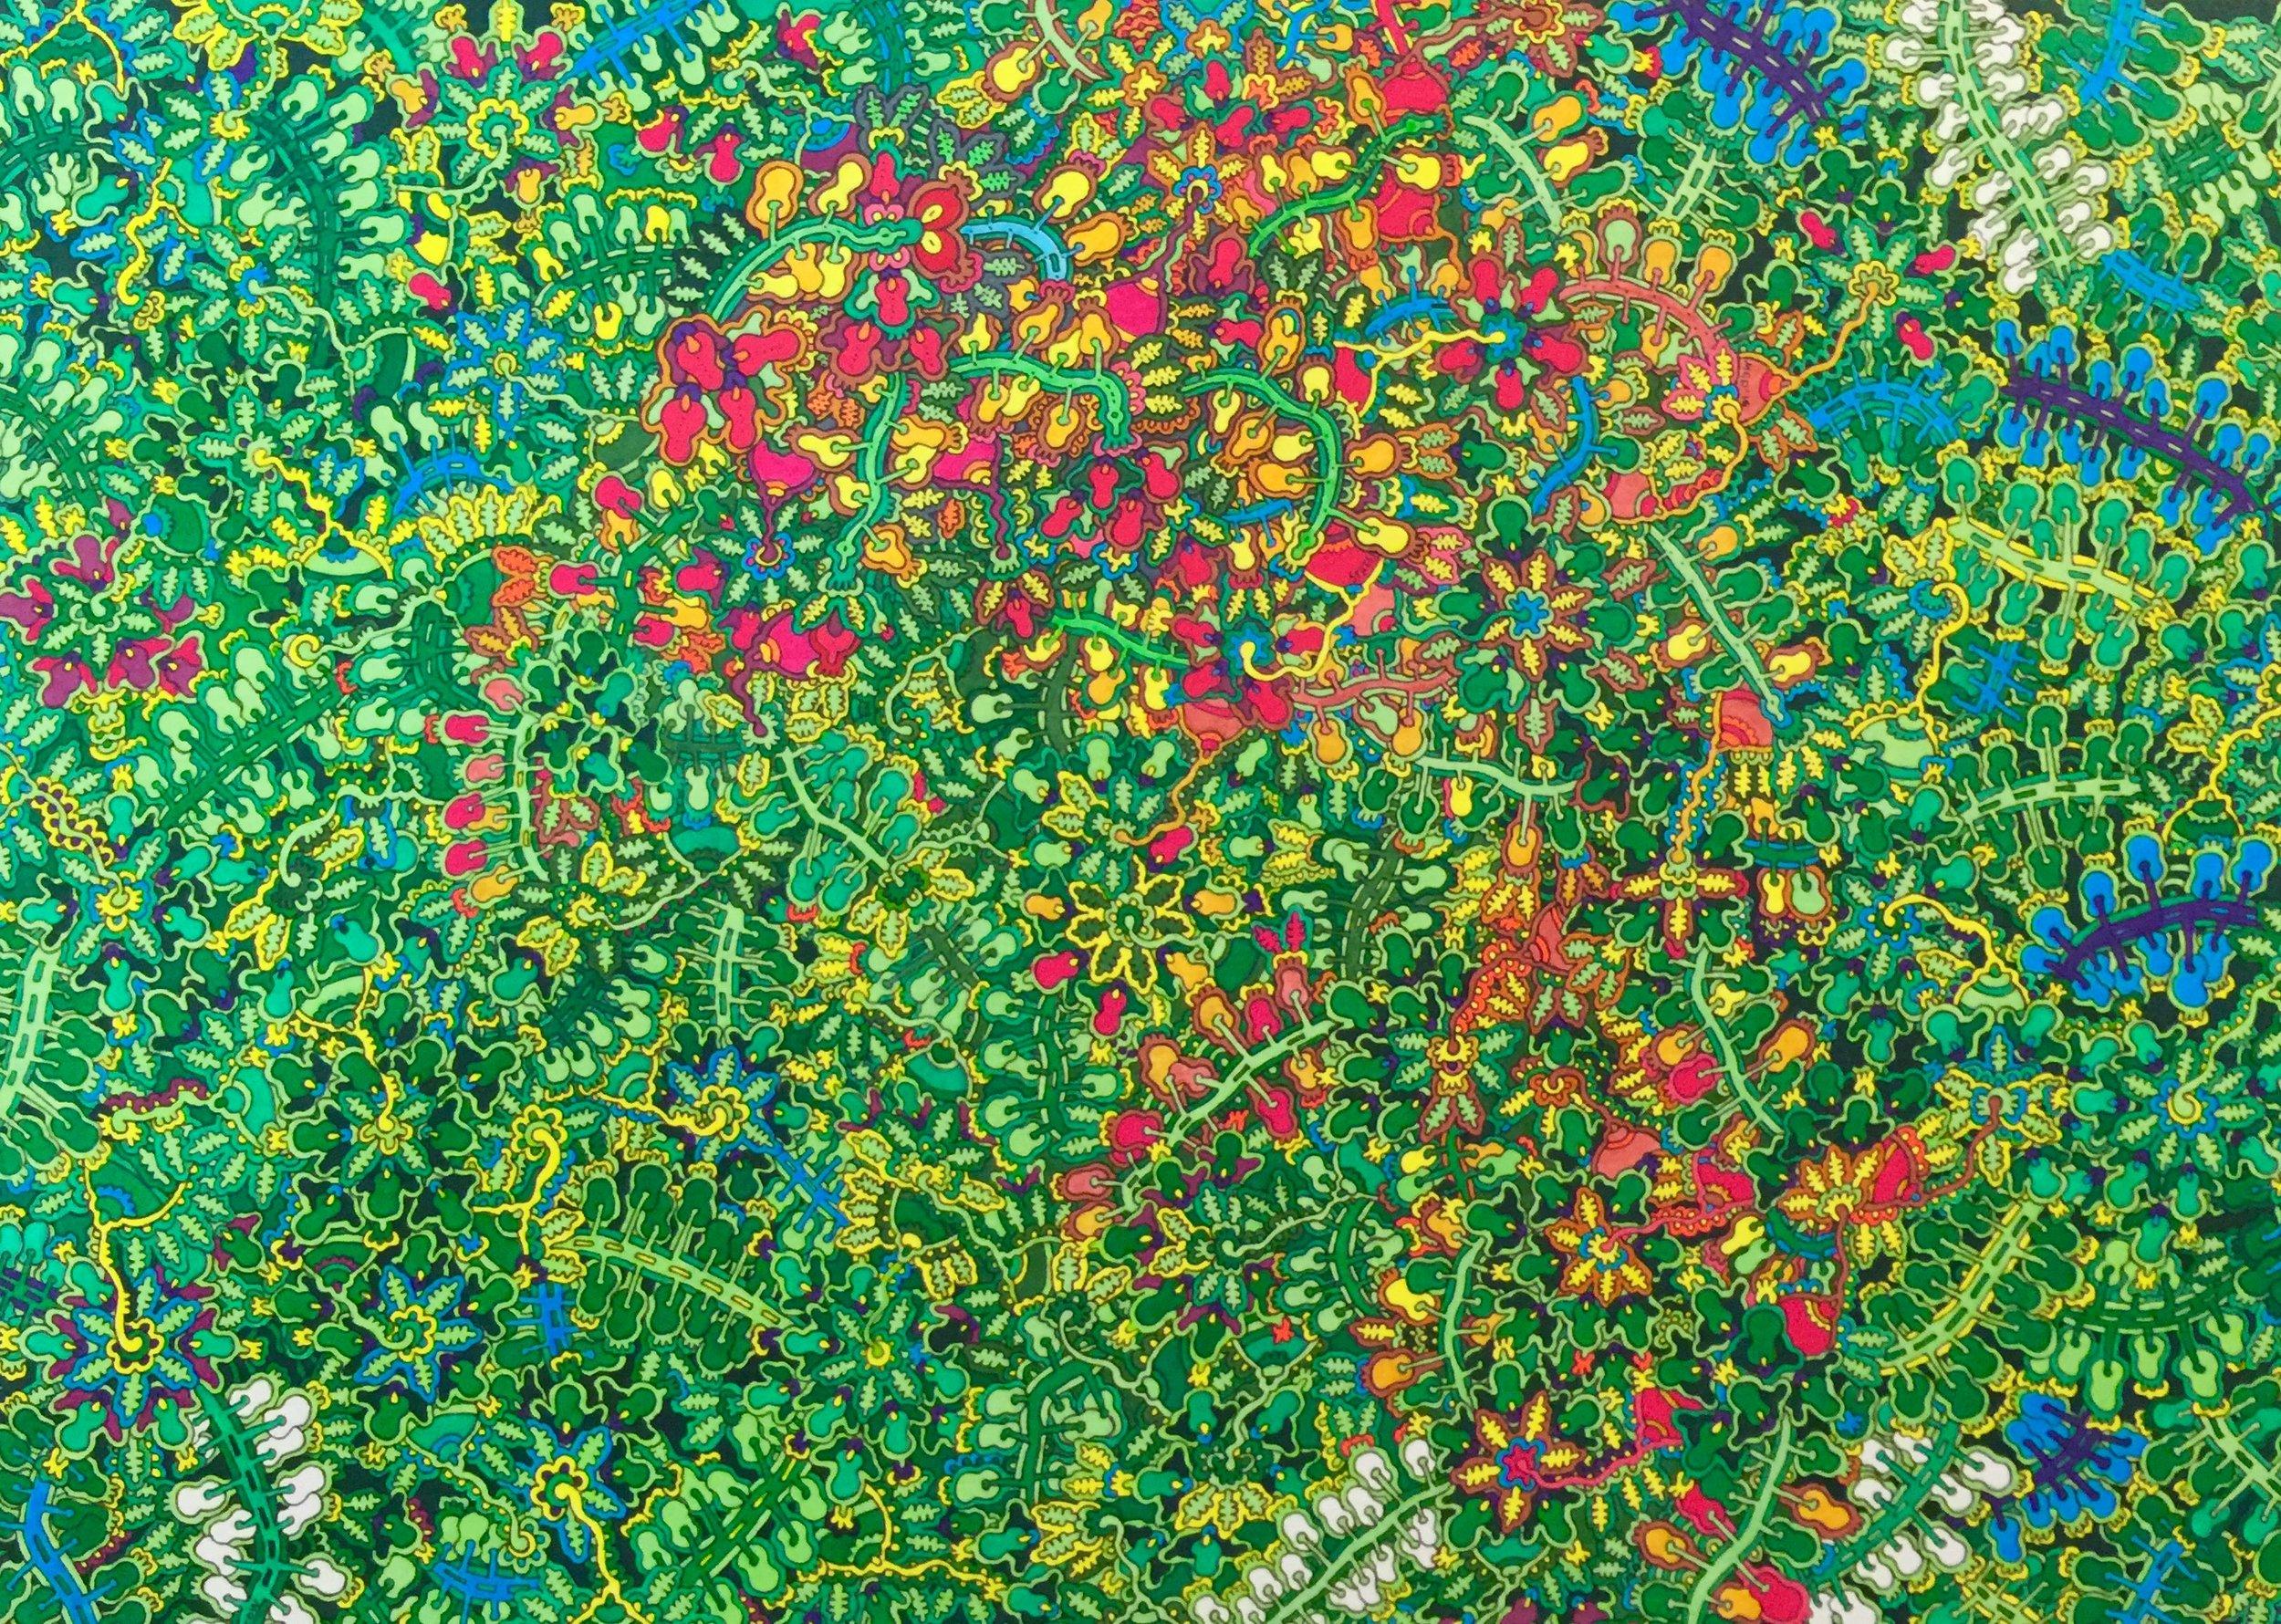 Max Goshko-Dankov, Green, Oil and Water based Markers on Paper, 30 x 40,  https://www.mgdankov.com/artworks